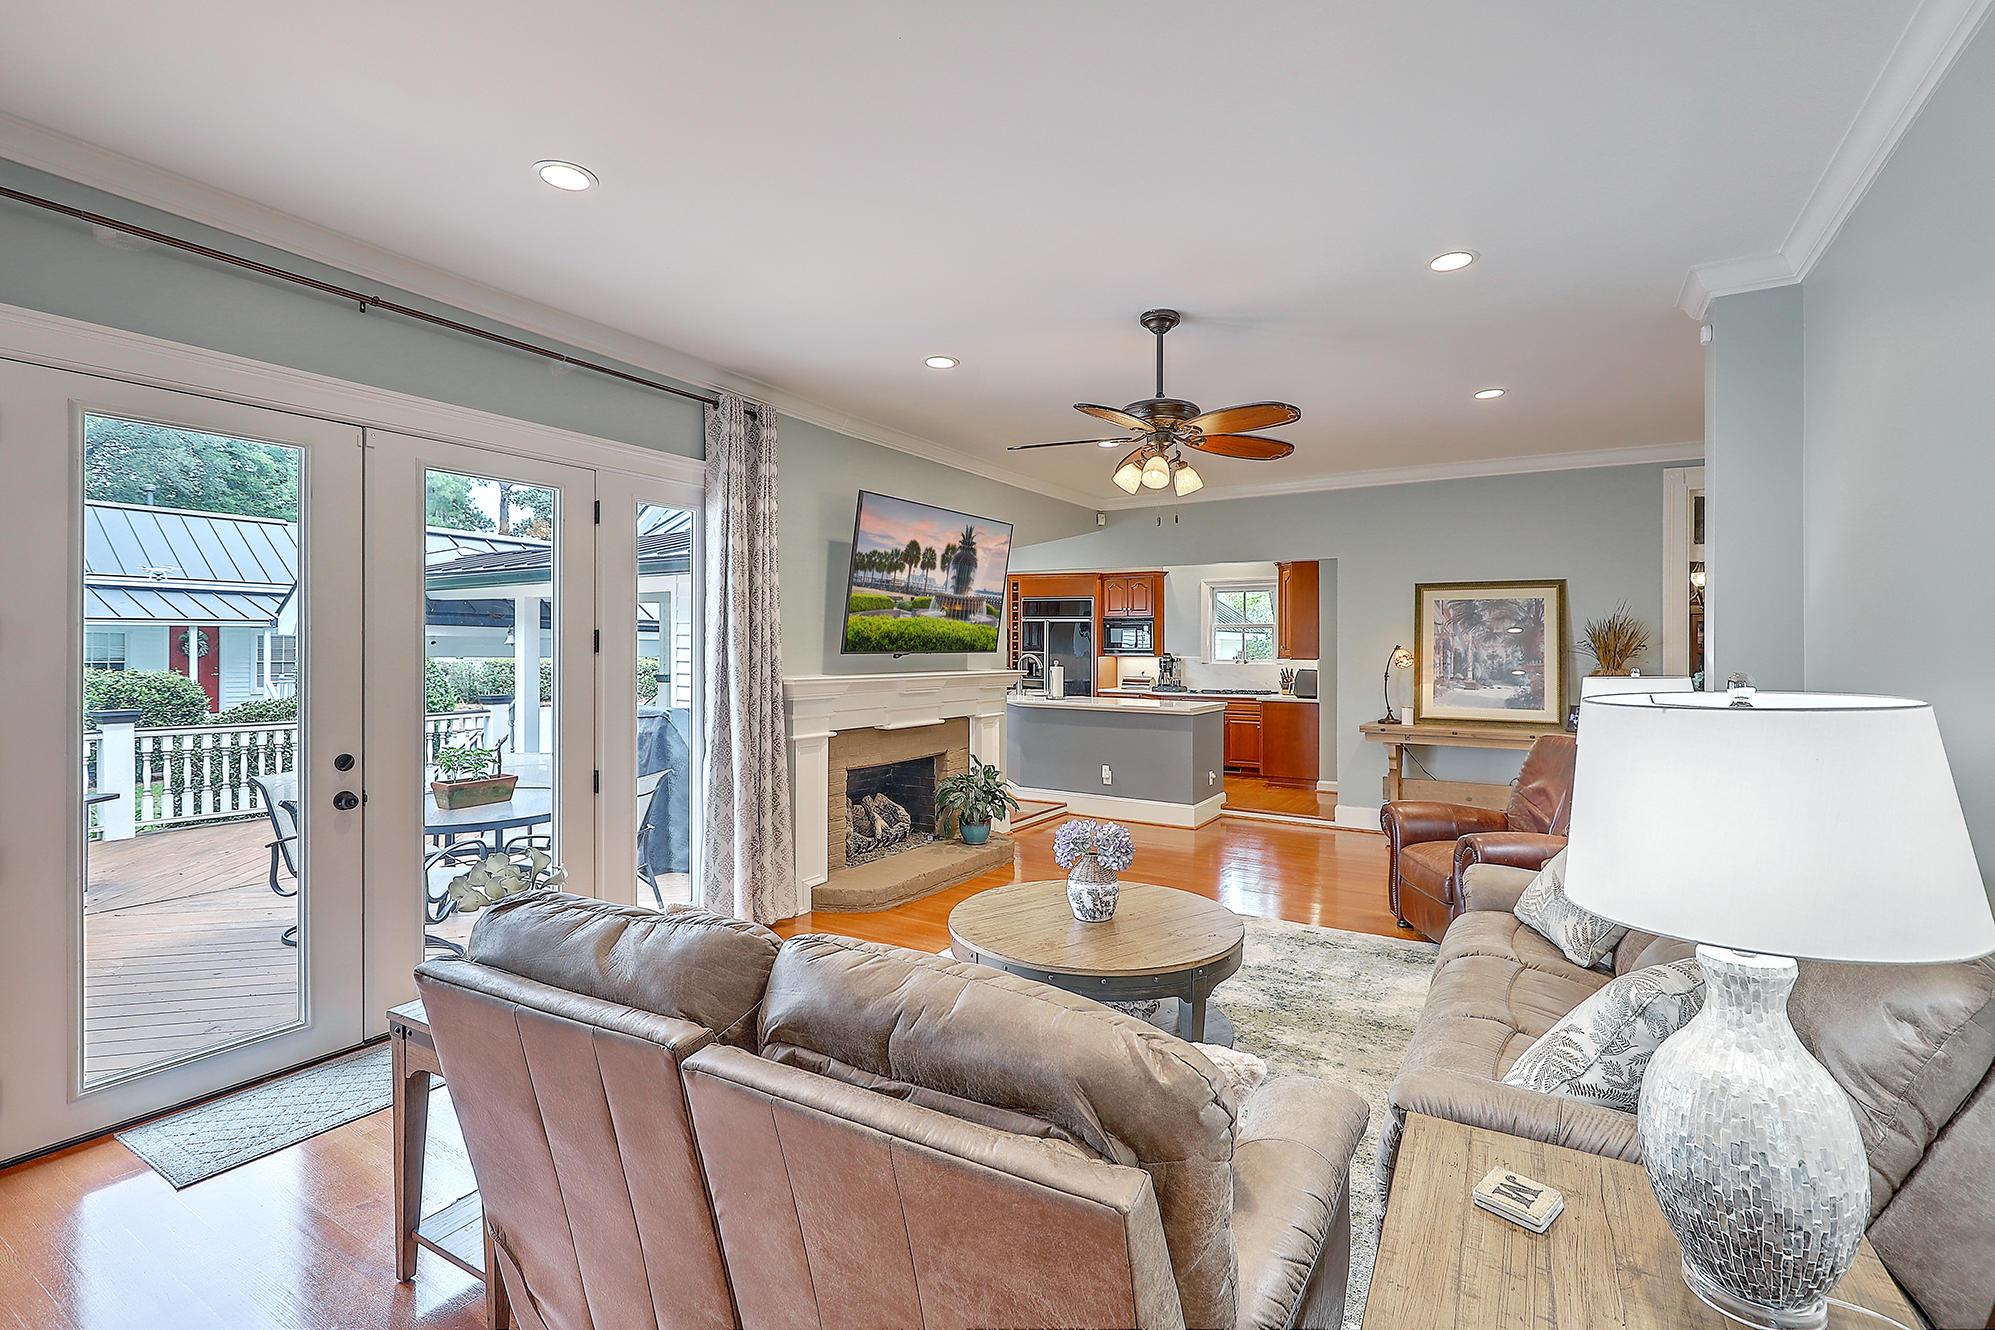 Summerville Homes For Sale - 102 Hickory, Summerville, SC - 62